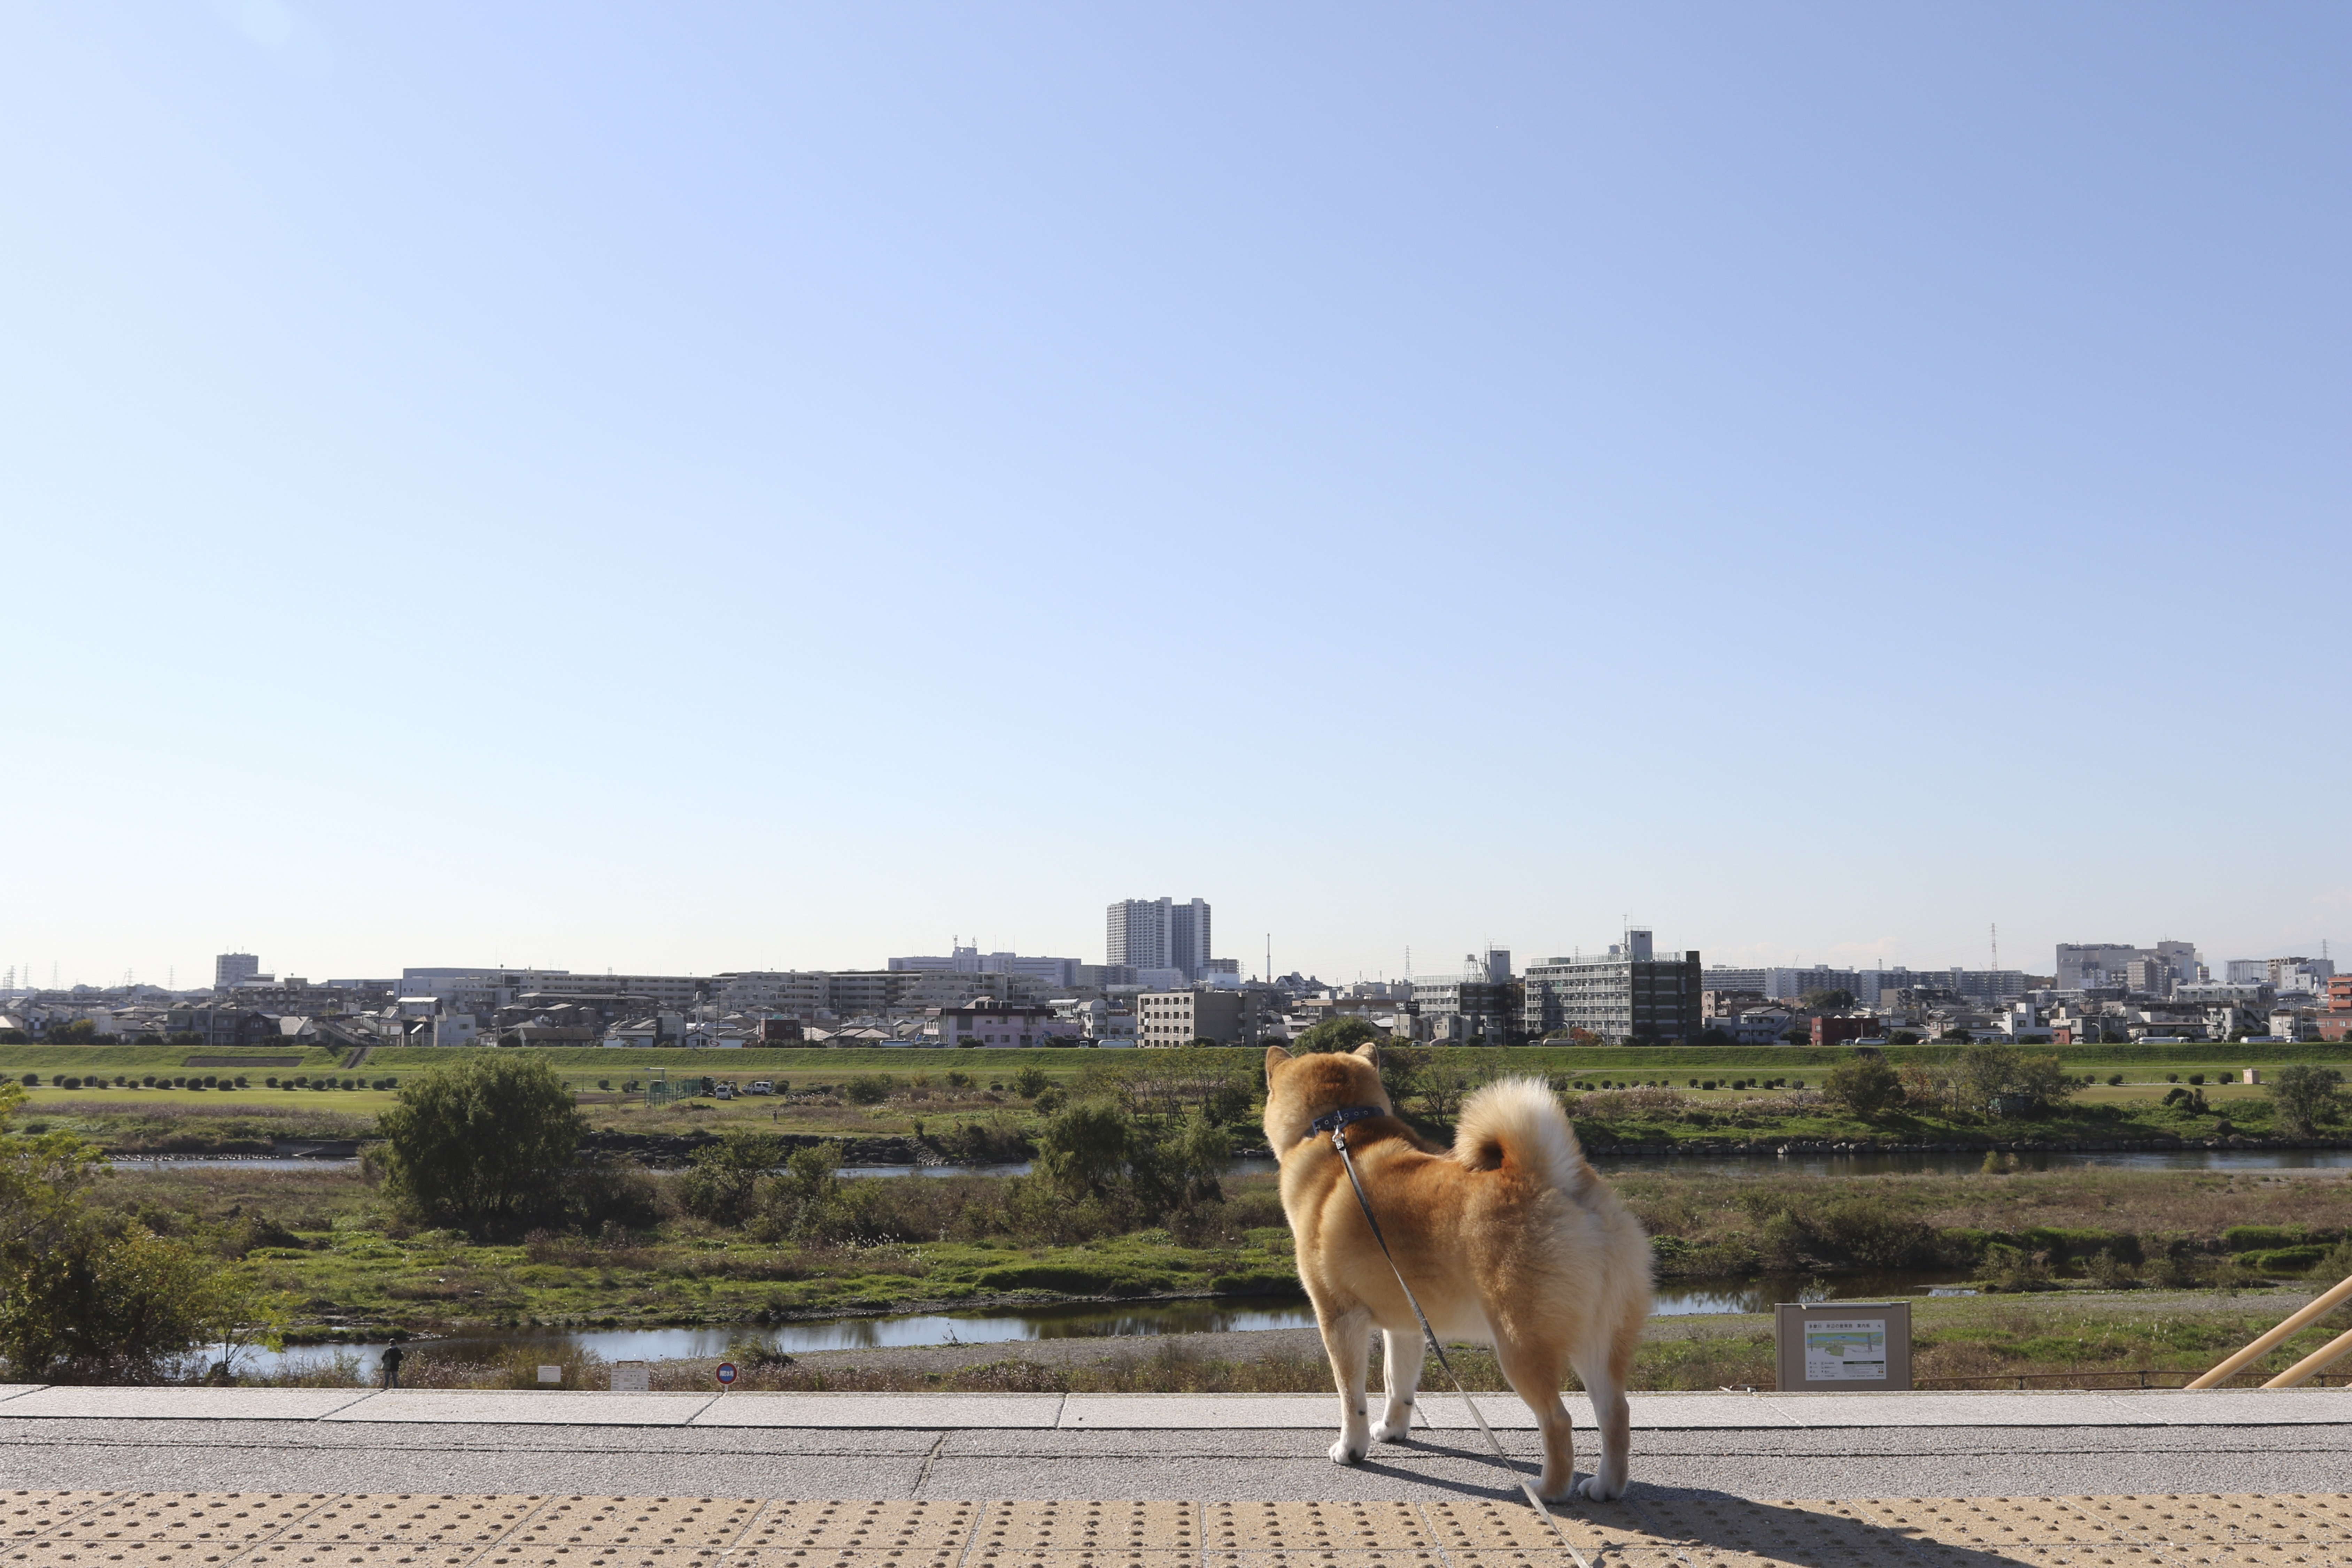 A3ノビ写真 「いい眺めだよー散歩編ー」